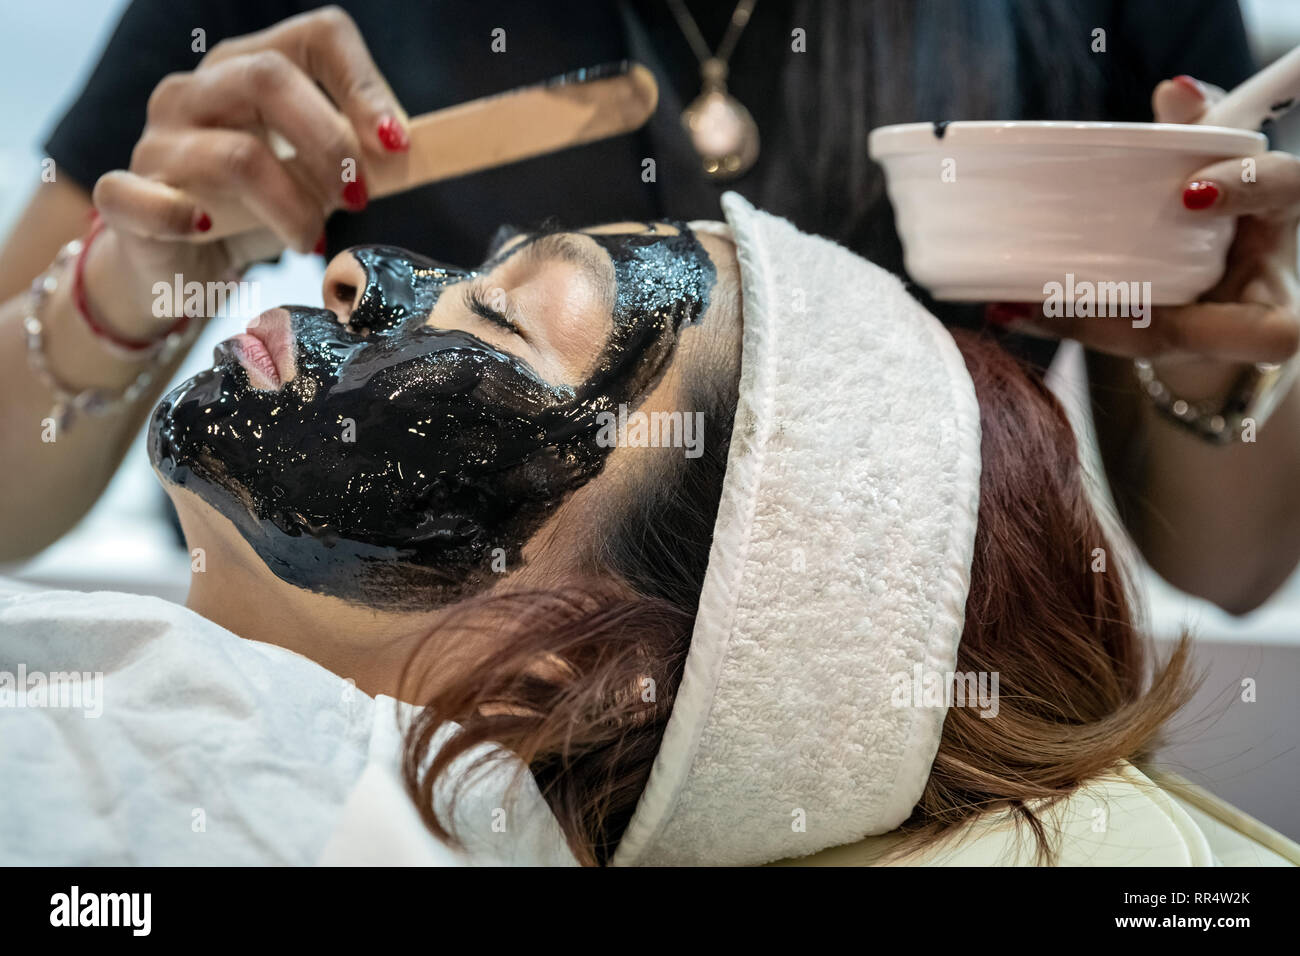 Peel Off Beauty Face Mask Stock Photos & Peel Off Beauty